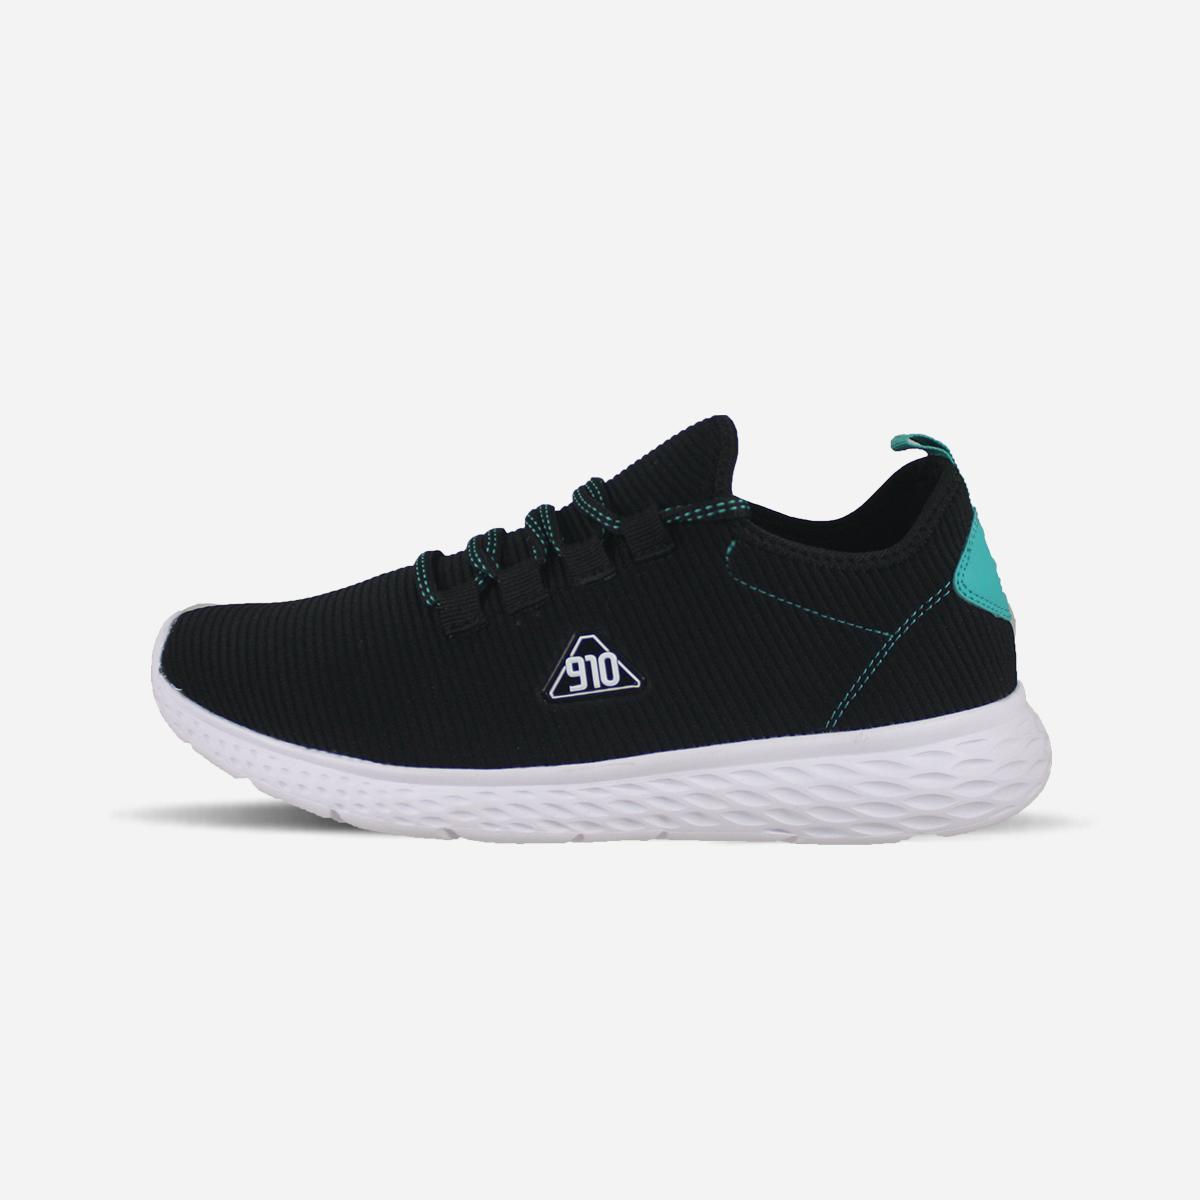 Jual Sepatu Lari 910 Termurah   Terbaru  f086c8e11a